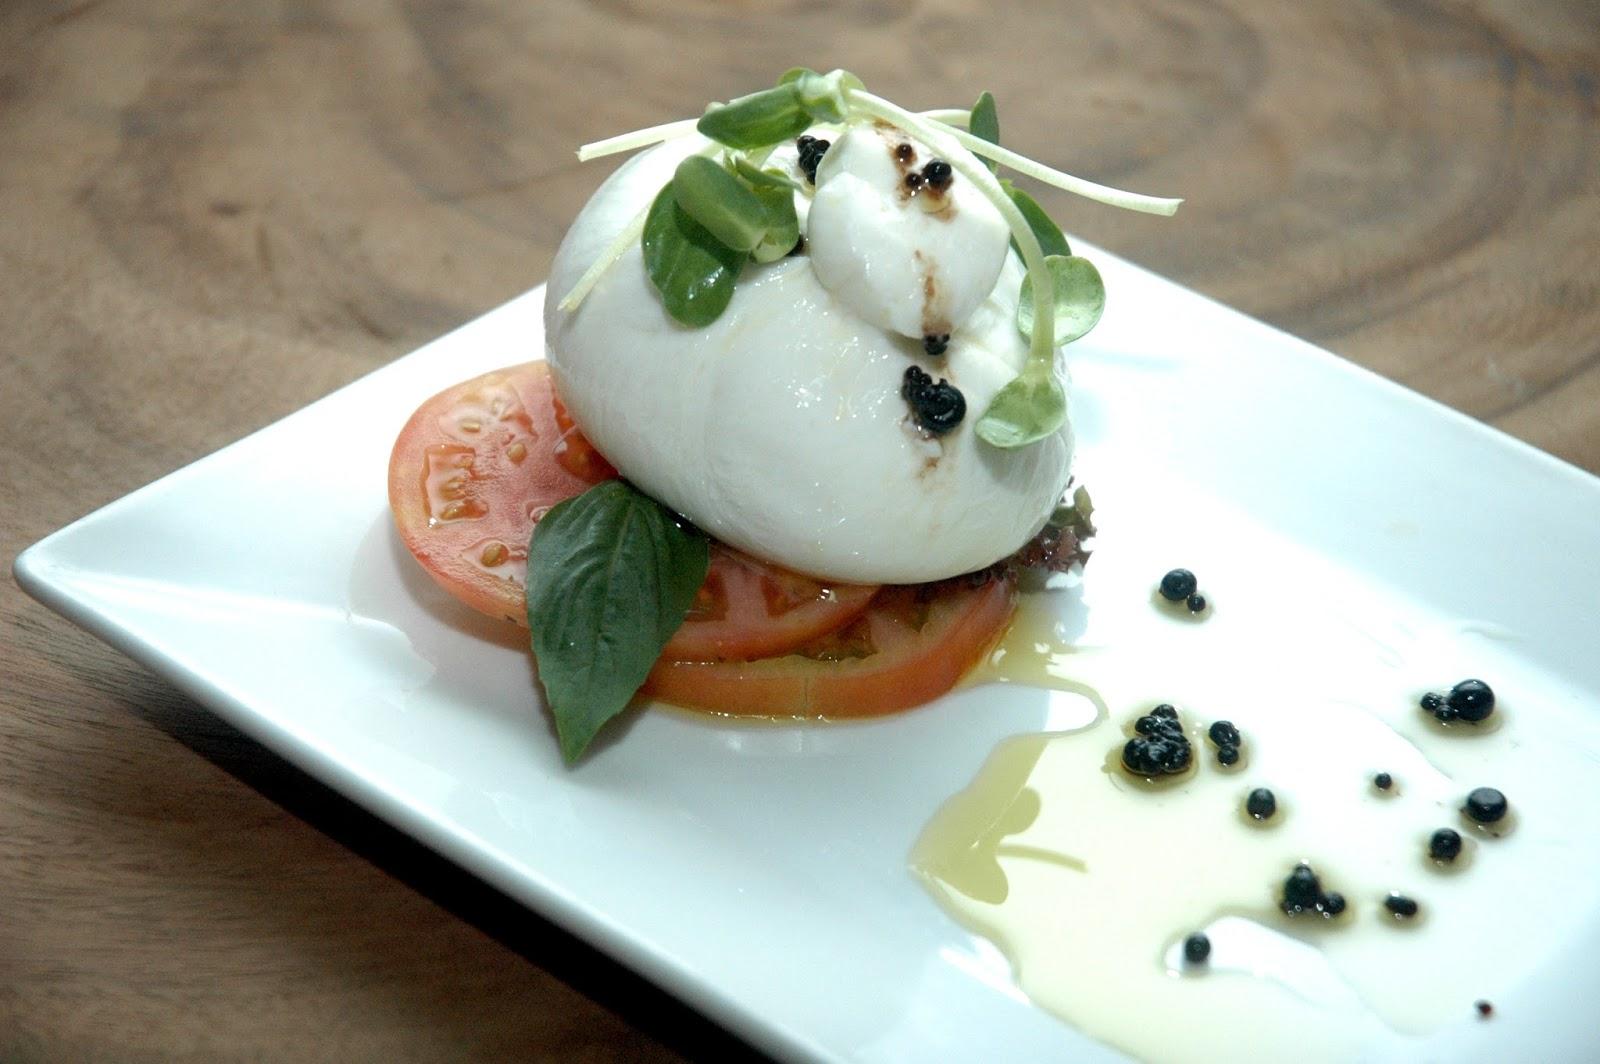 Gino S Cafe Bornheim